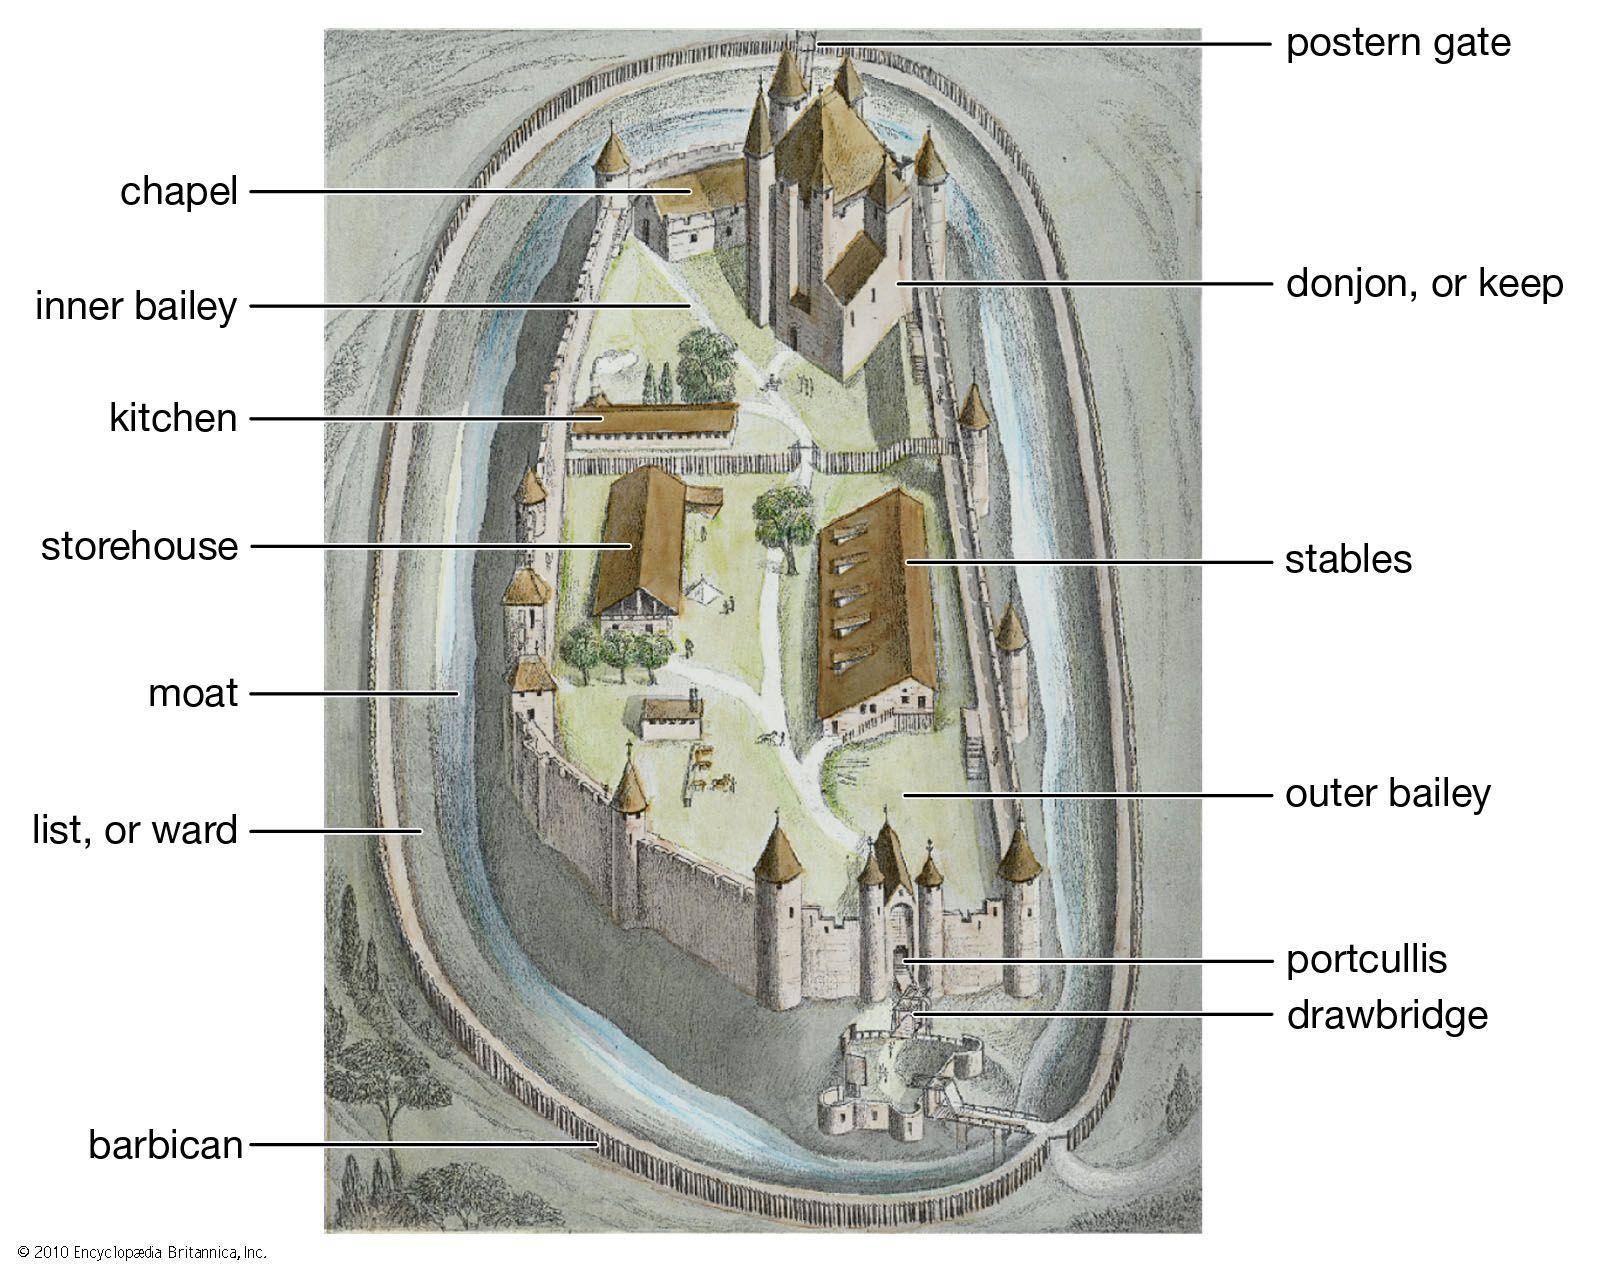 8a483f0a5b19fdd09e989f5b326068d8 world building concept map city village layout medieval castles